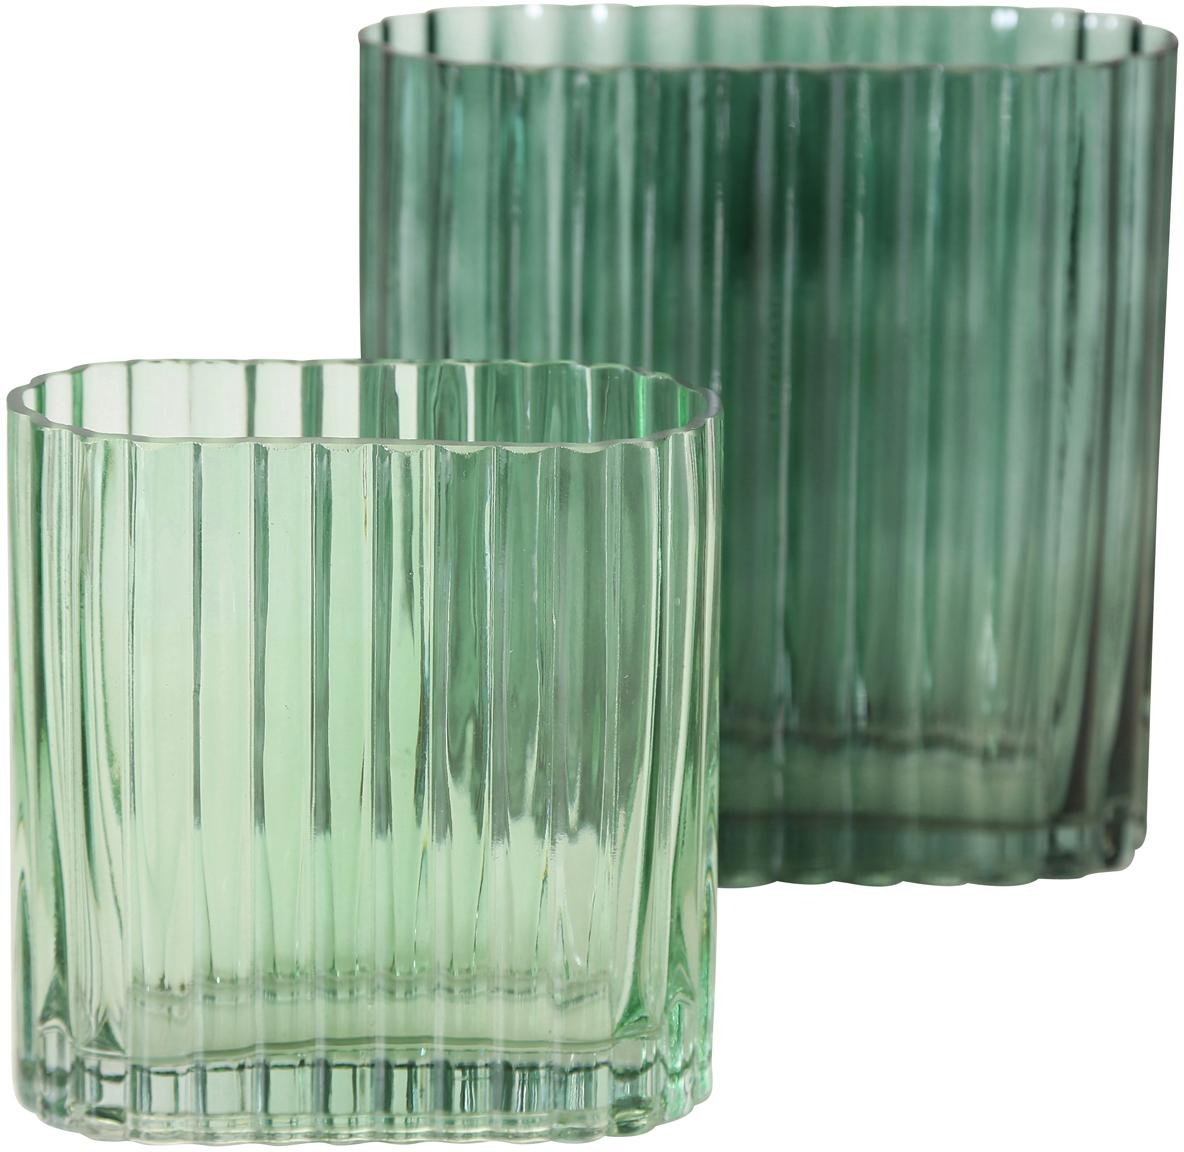 Set 2 vasi in vetro verde Tulipa, Vetro, Verde, Set in varie misure